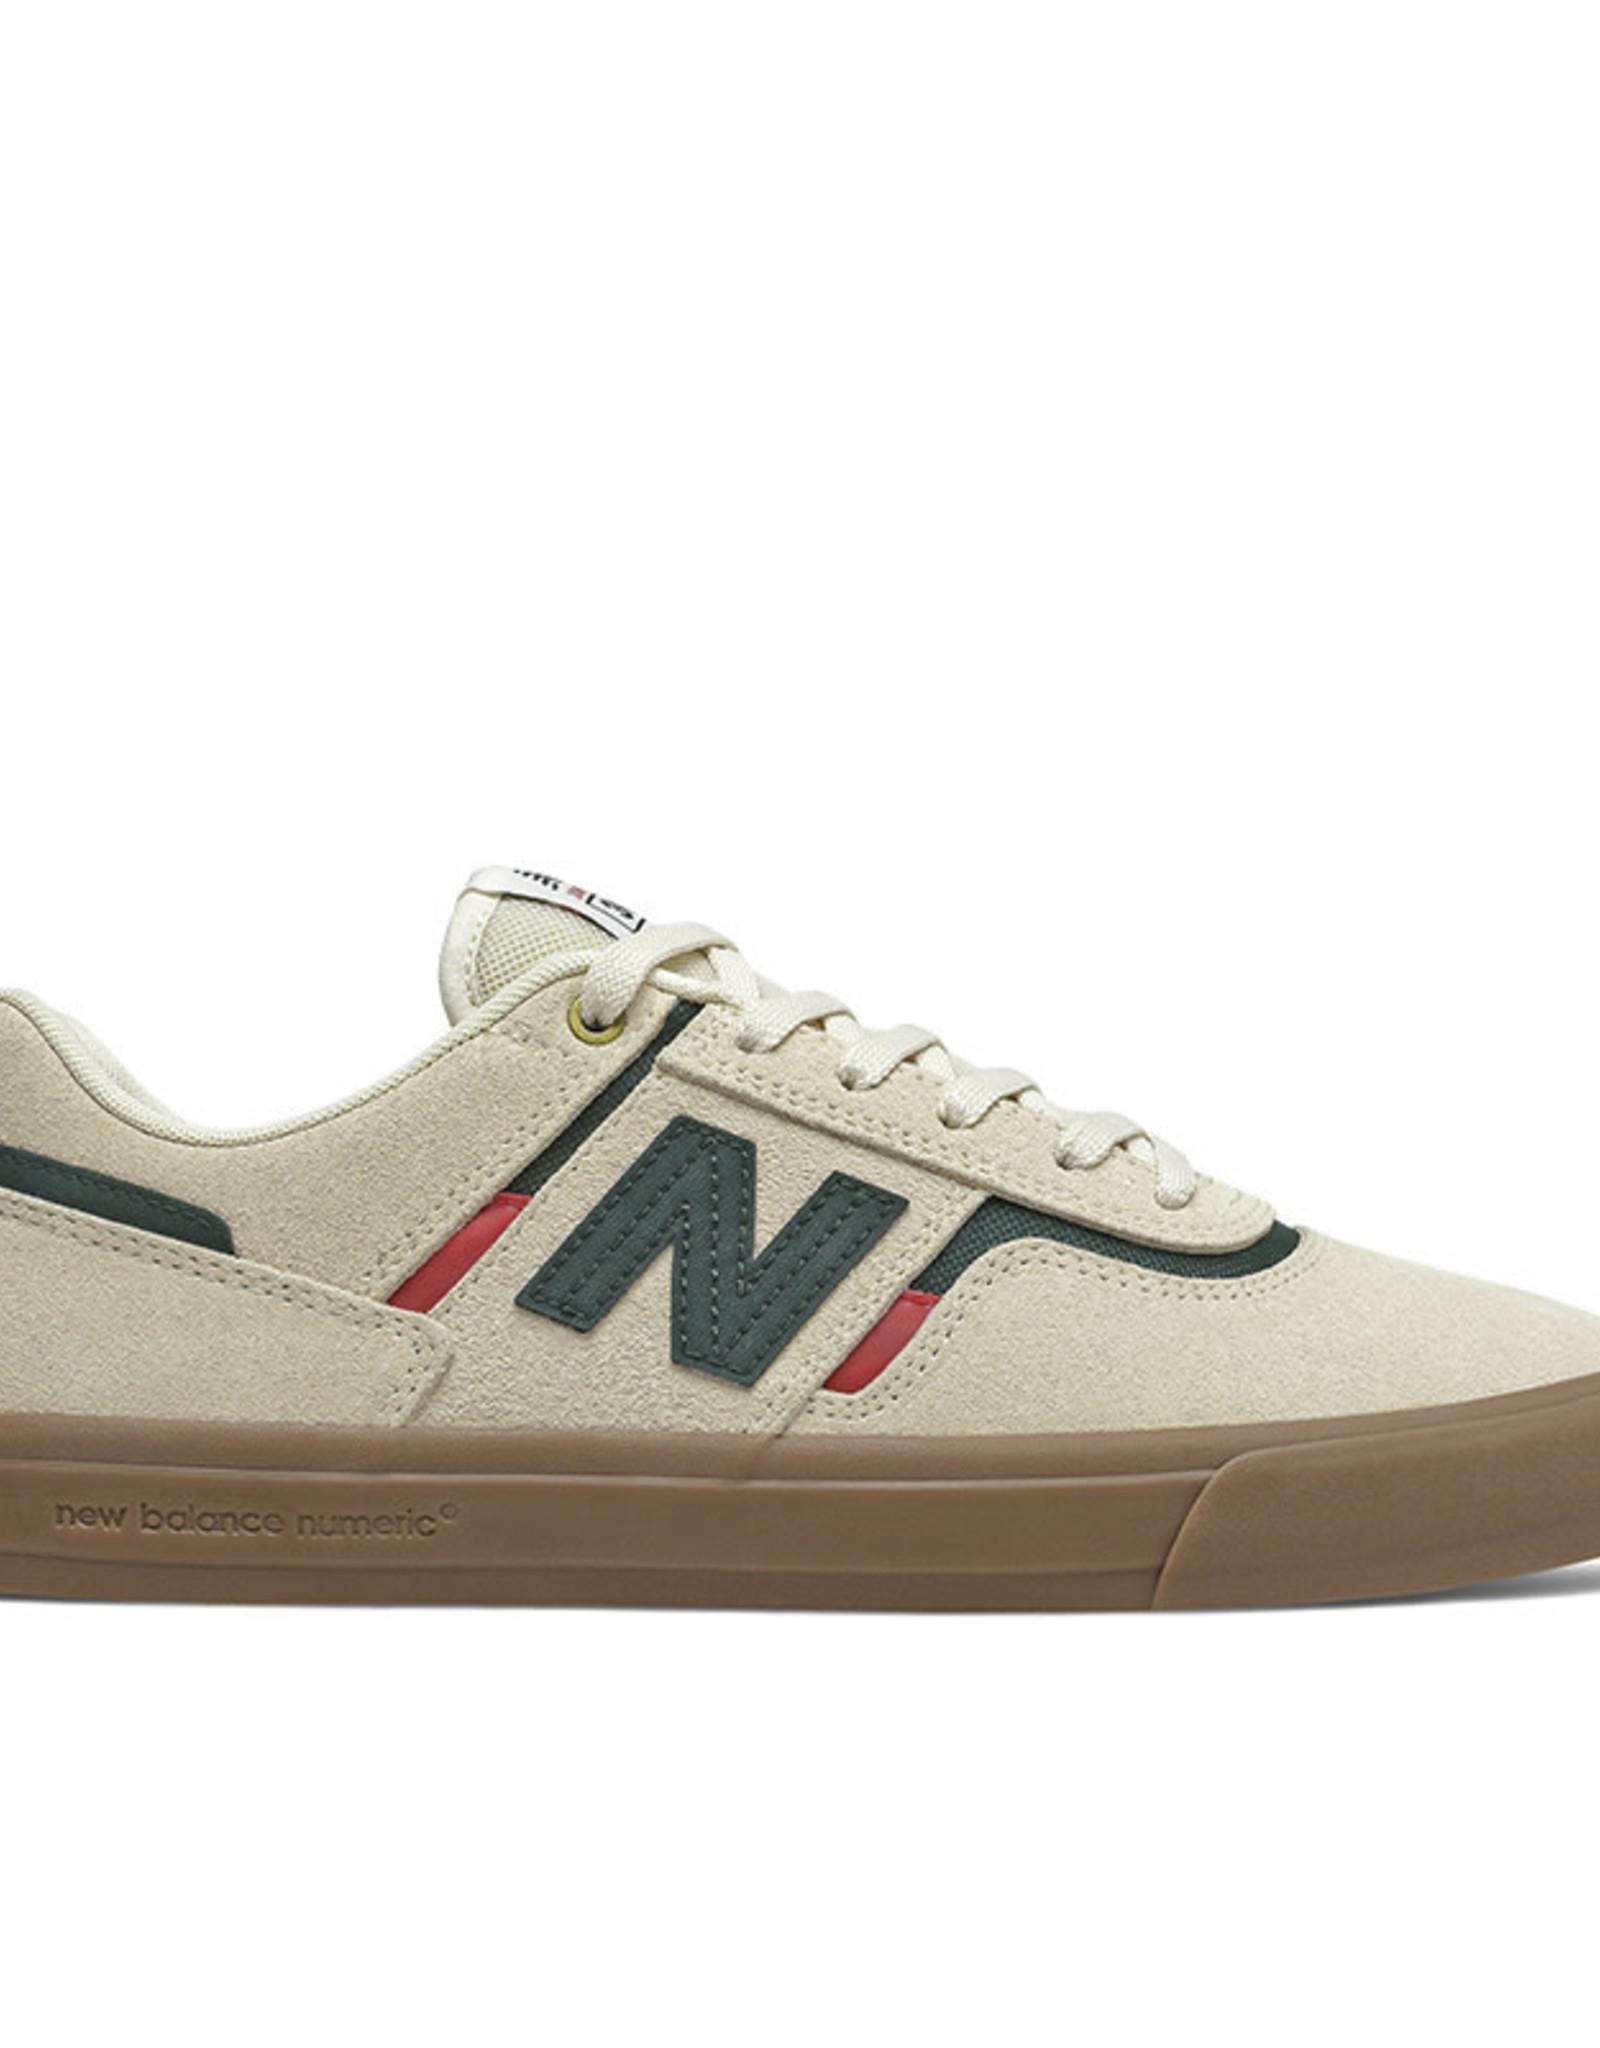 New Balance NB NUMERIC 306 FOY CREAM/DARK GREEN